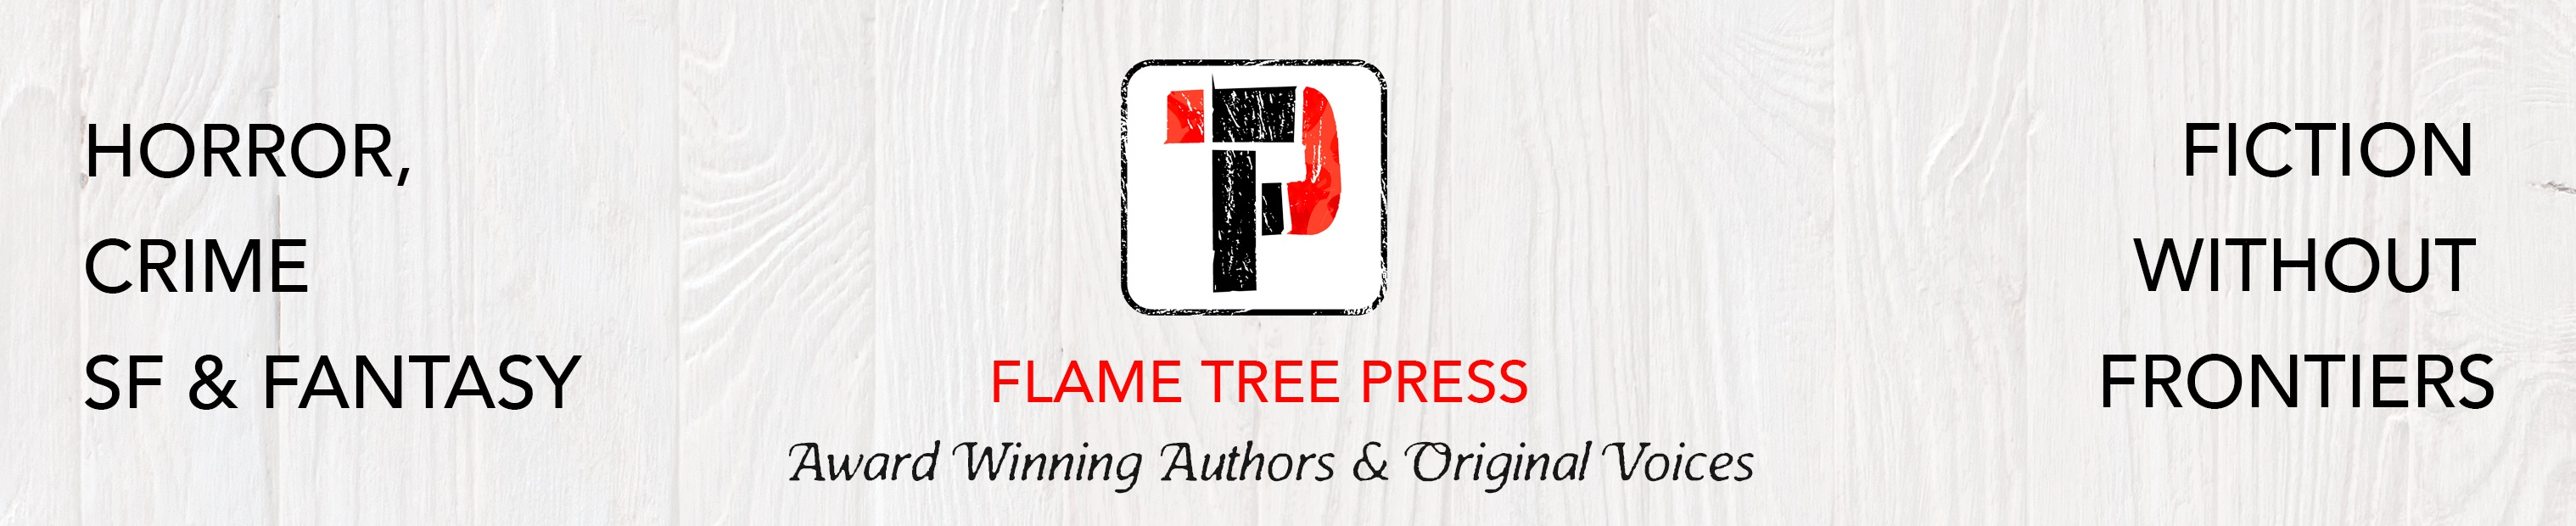 Hubspot header Flame Tree Press 02.jpg